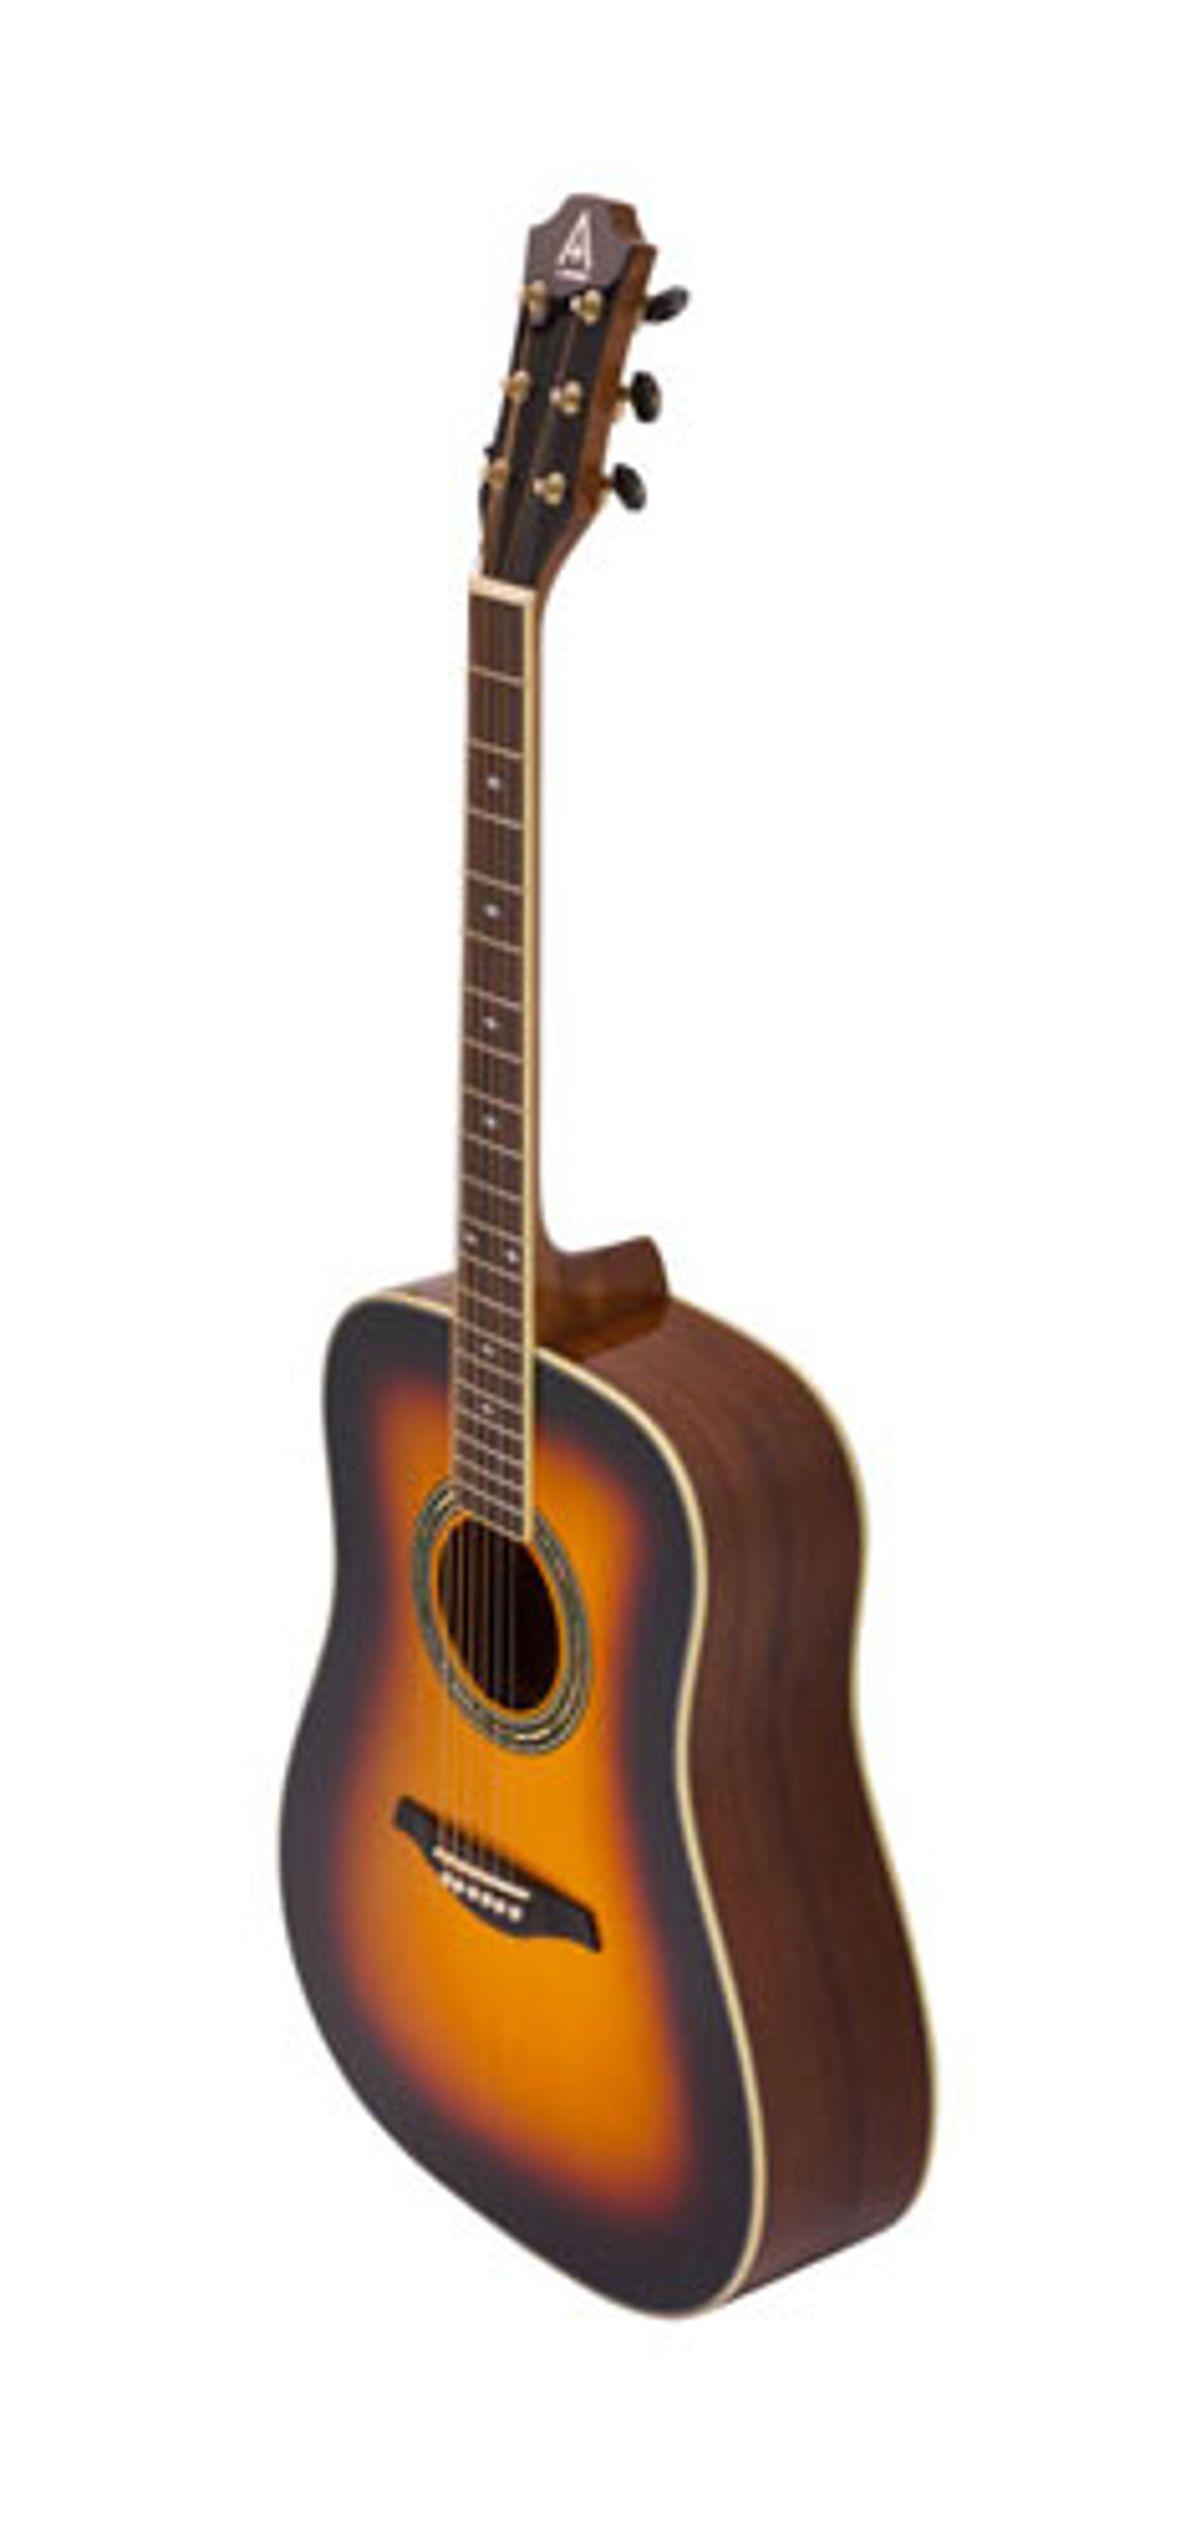 Hohner Expands A+ Acoustic Guitar Line